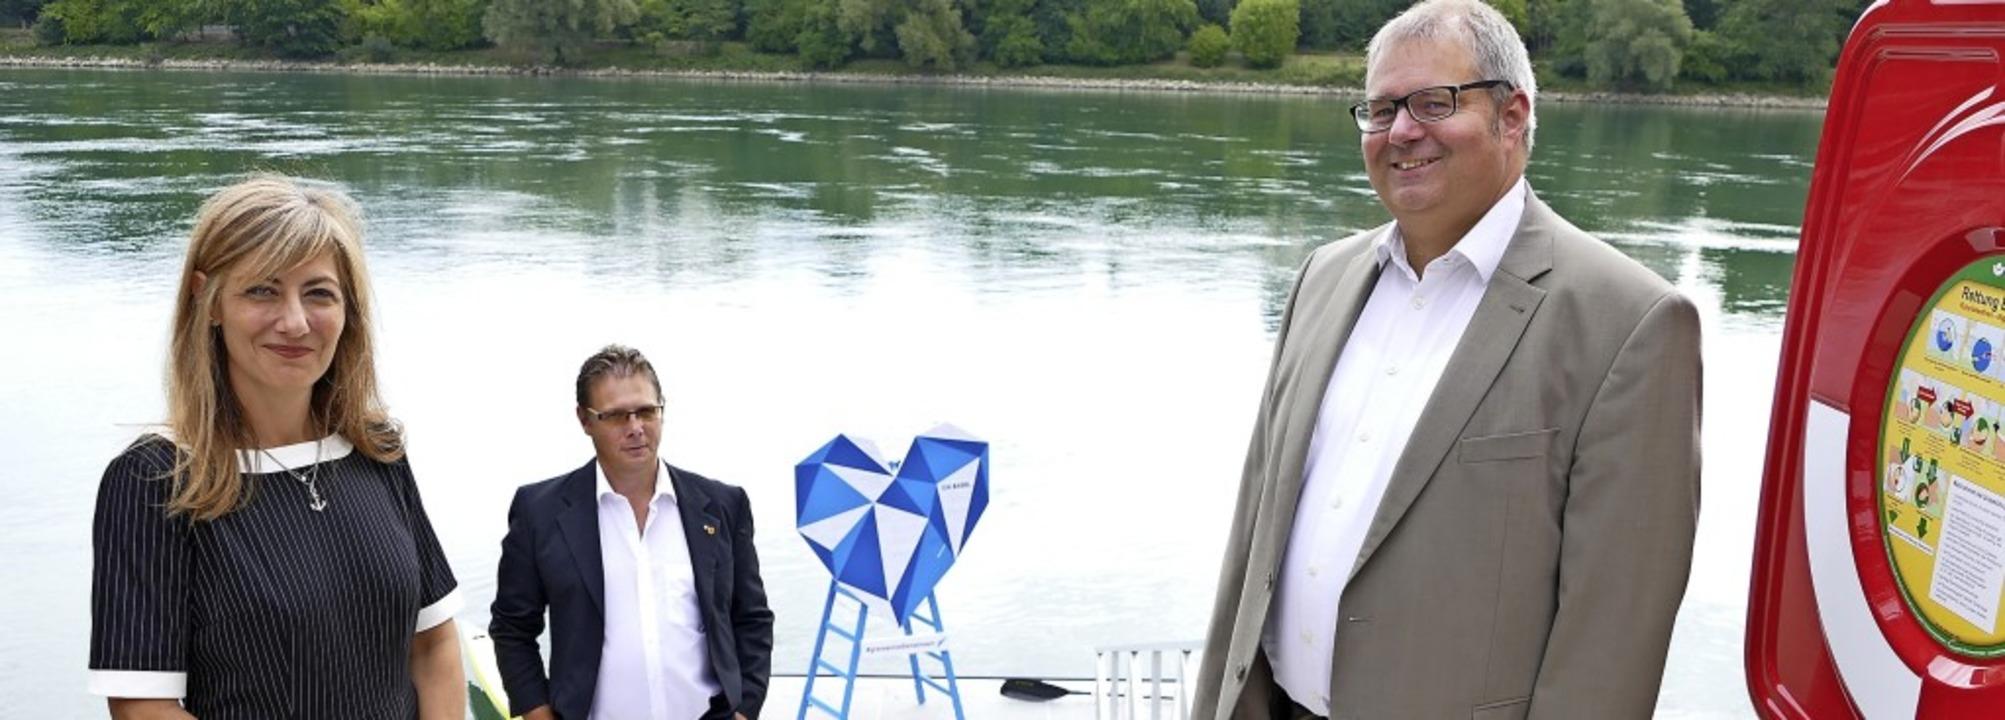 "Bürgermeister Alexander Guhl (rechts) ...lisiert die ""Rheinliebe"".   | Foto: David Rutschmann"